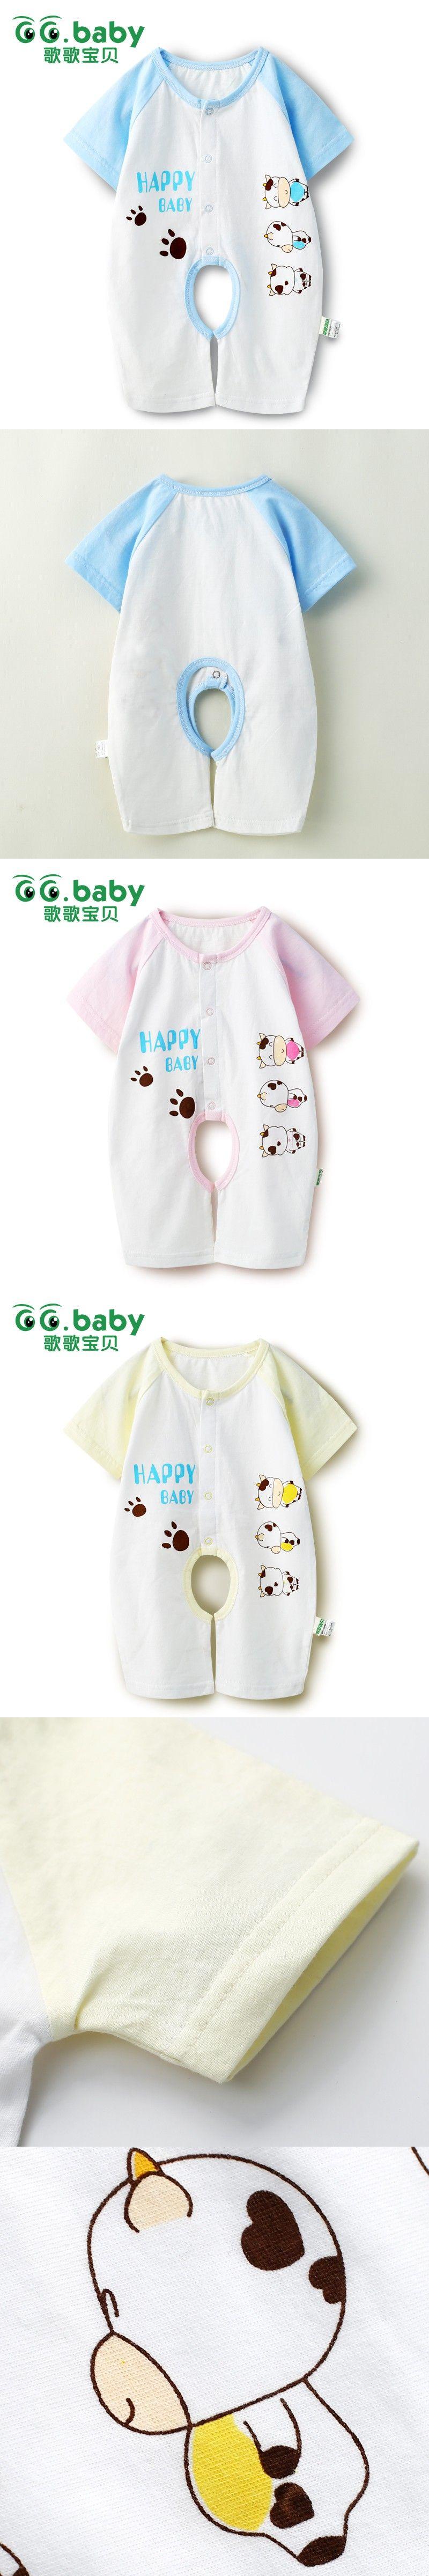 930c80666 New GG.Baby Brand Newborn Baby Rompers Boy Clothes Baby Girl Romper ...